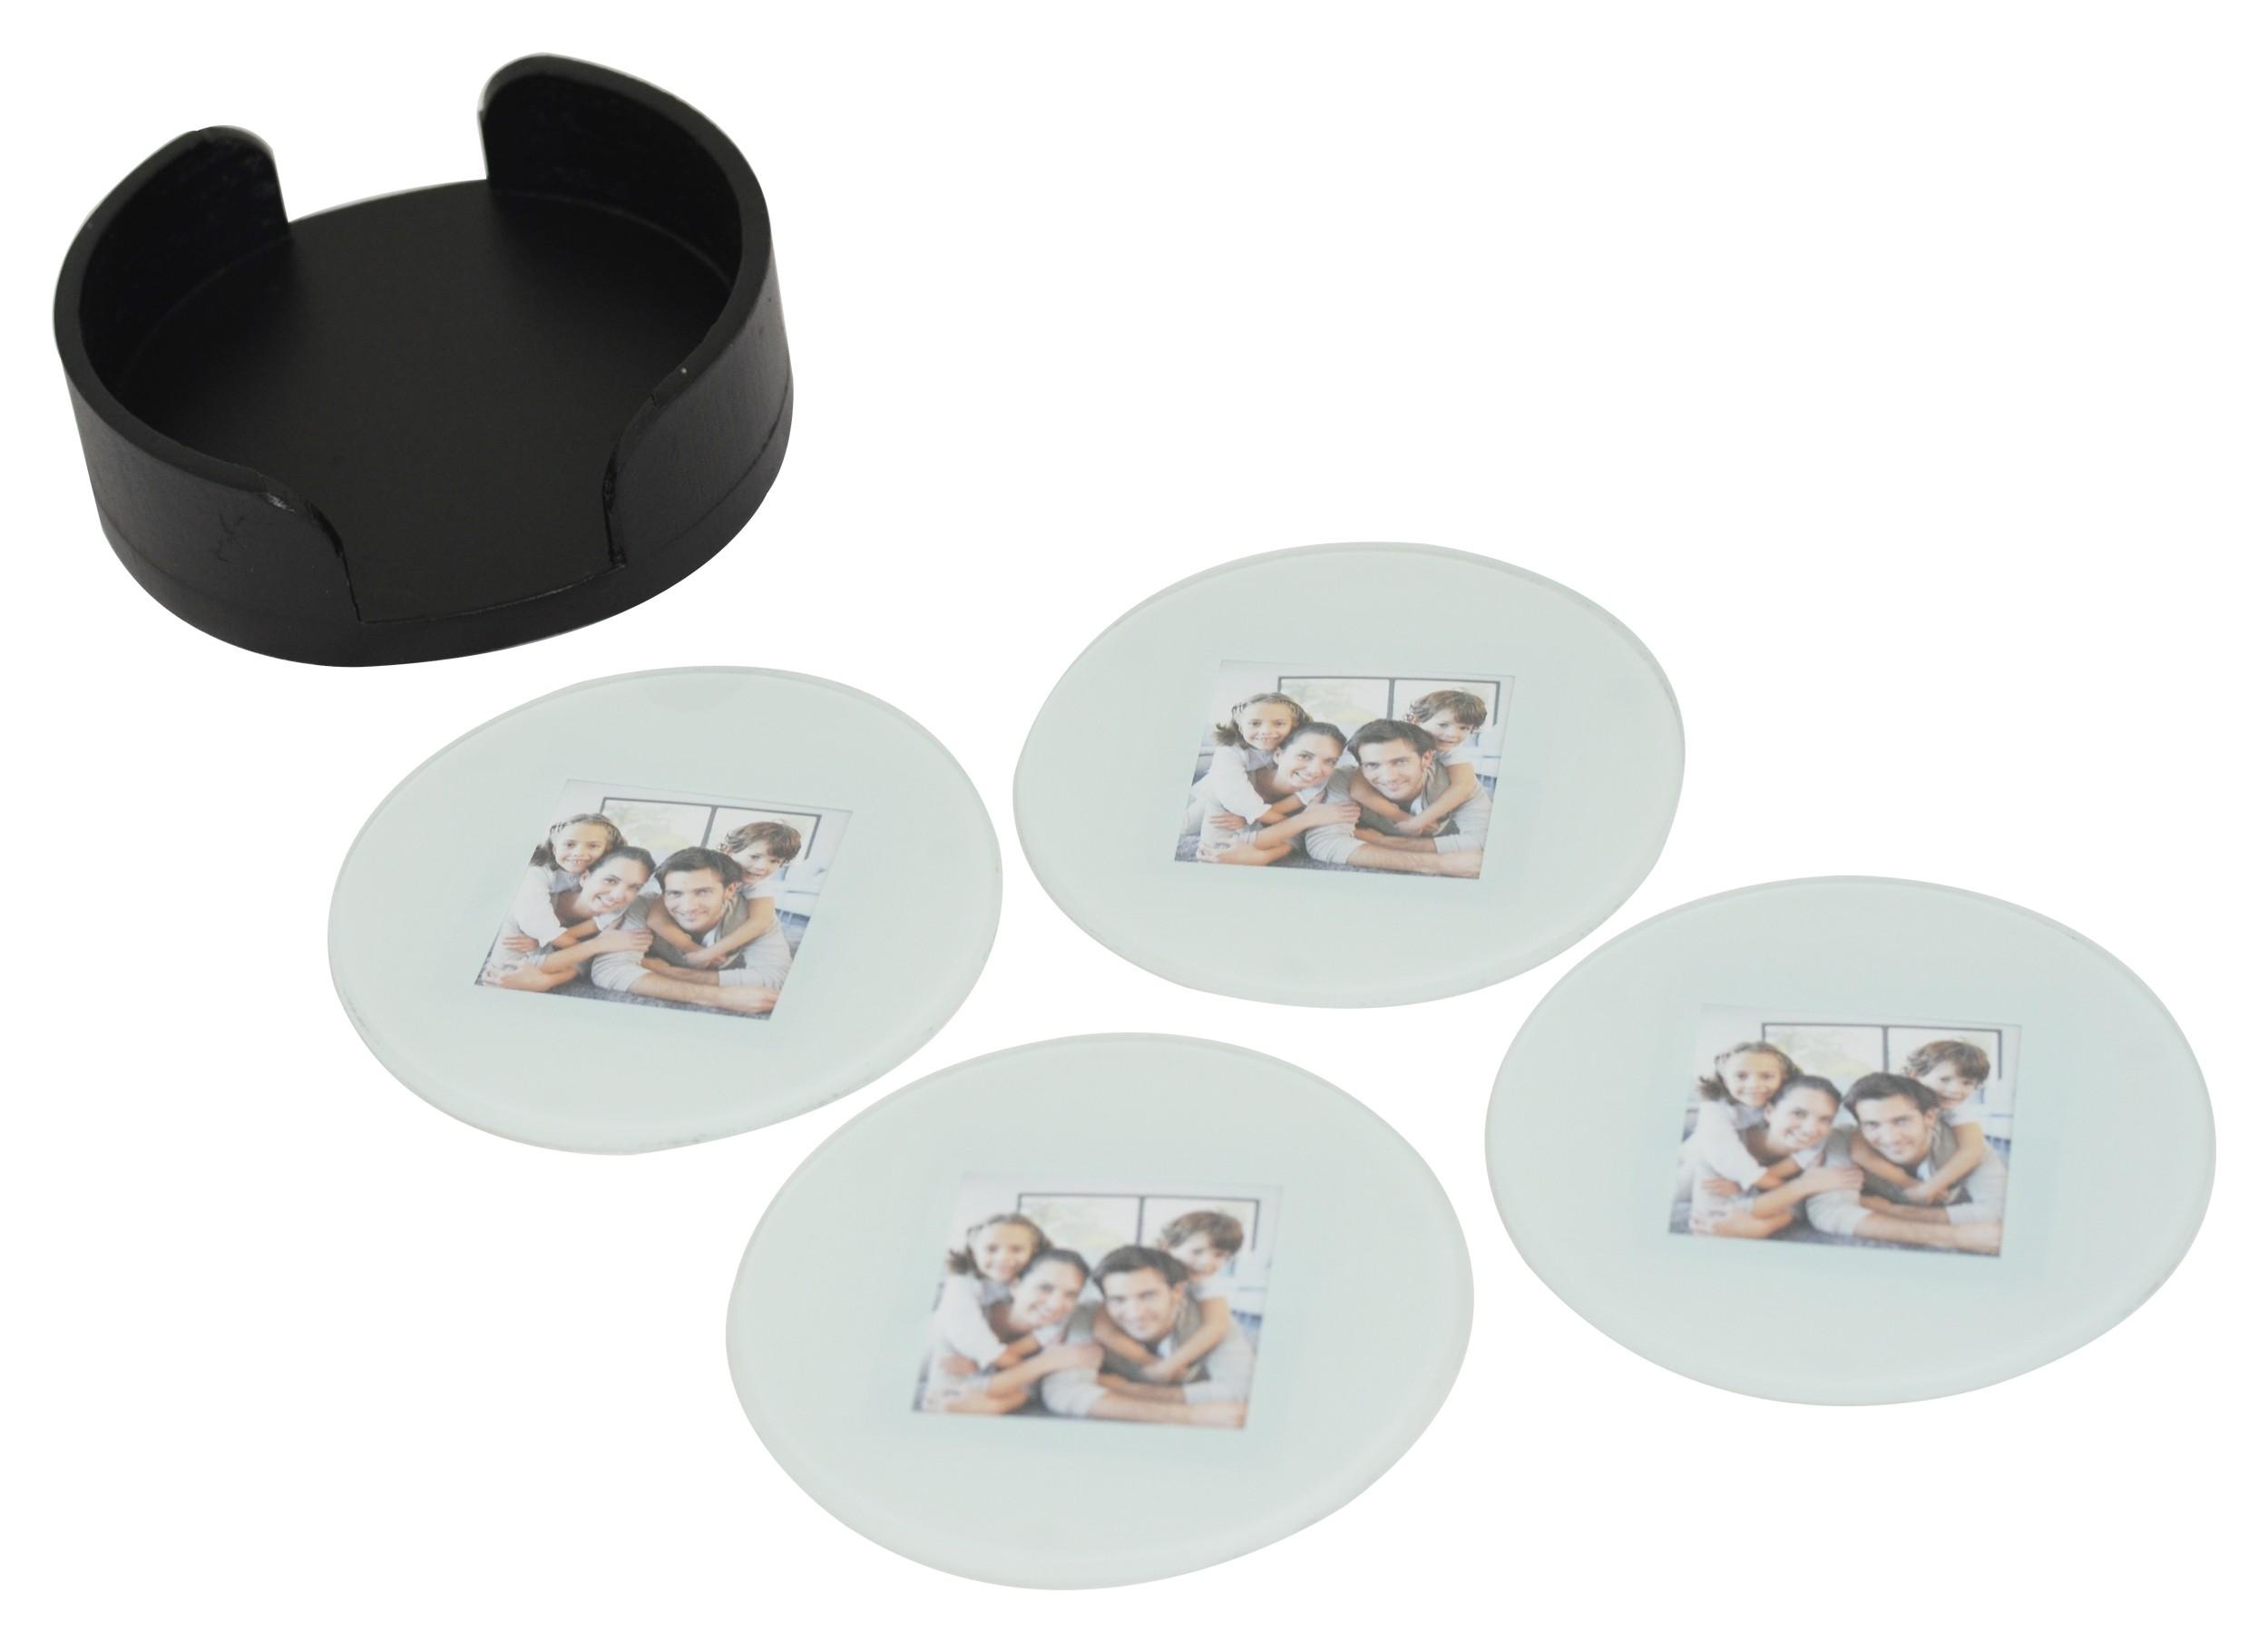 Set of 4 Glass Photo Frame Coasters W/ Wood Storage Rack